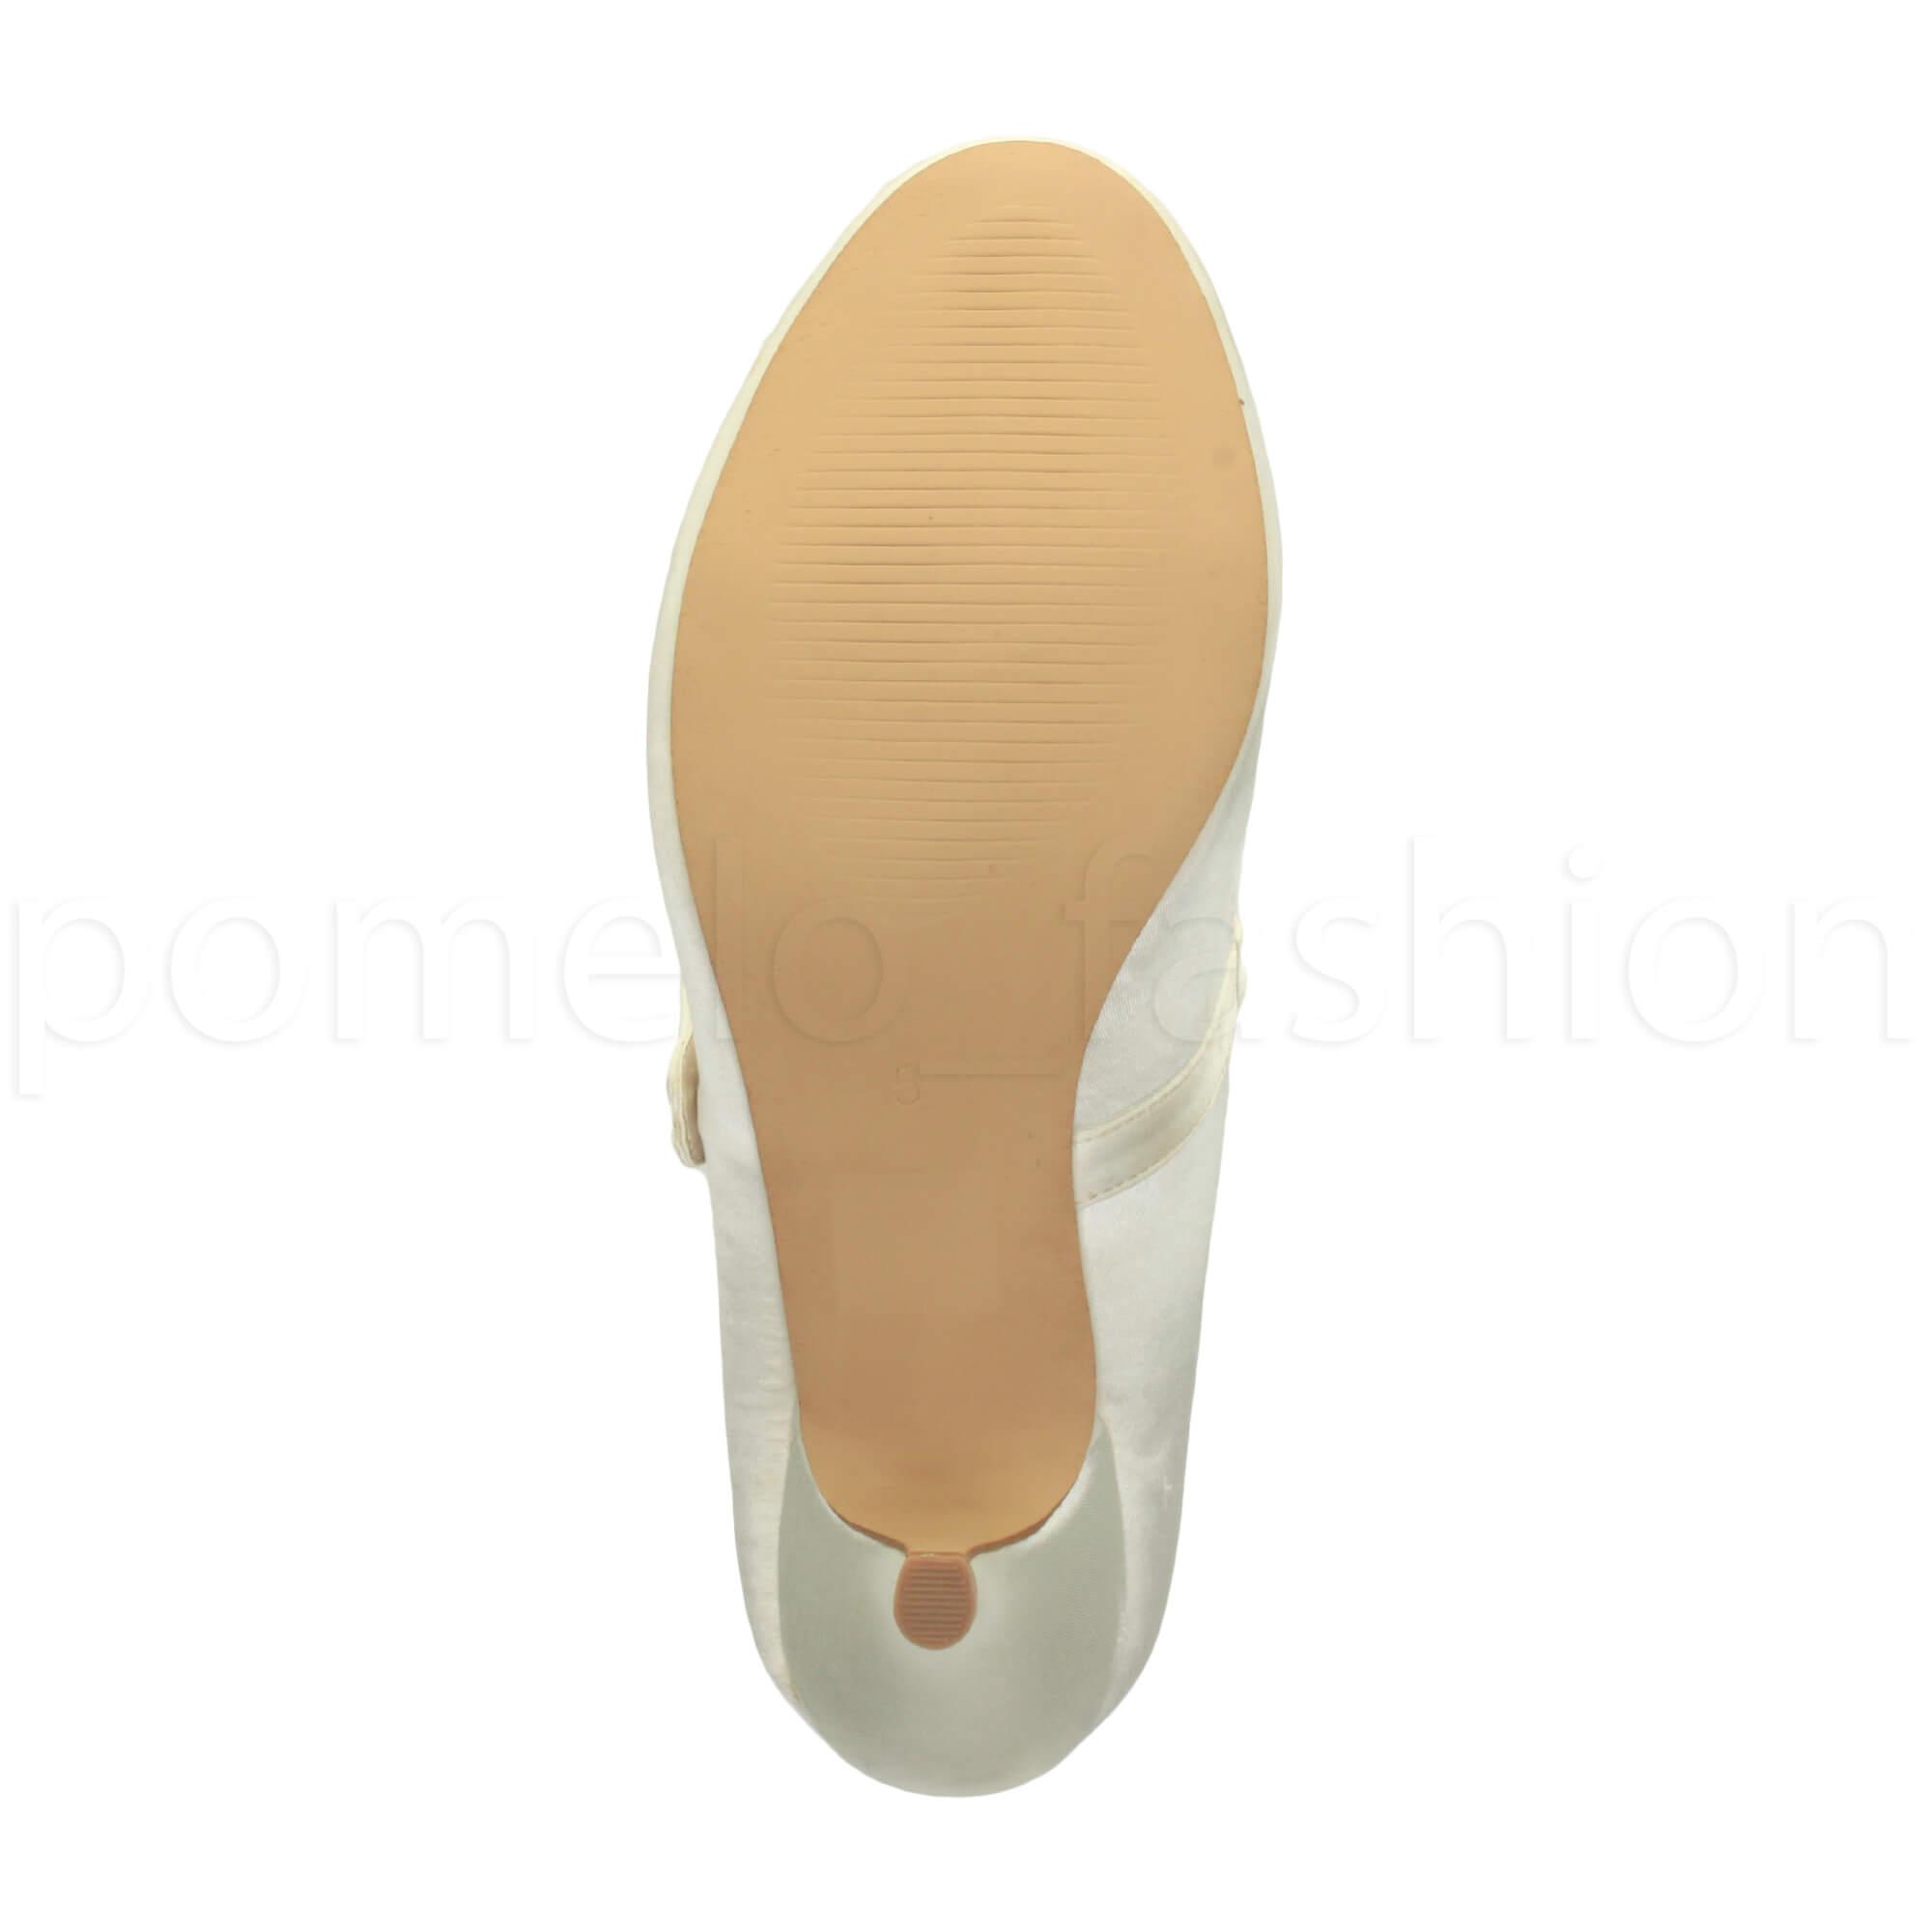 miniatura 85 - Donna basso tacco medio Mary Jane Damigella Matrimonio Pompe Scarpe Da Sera Taglia